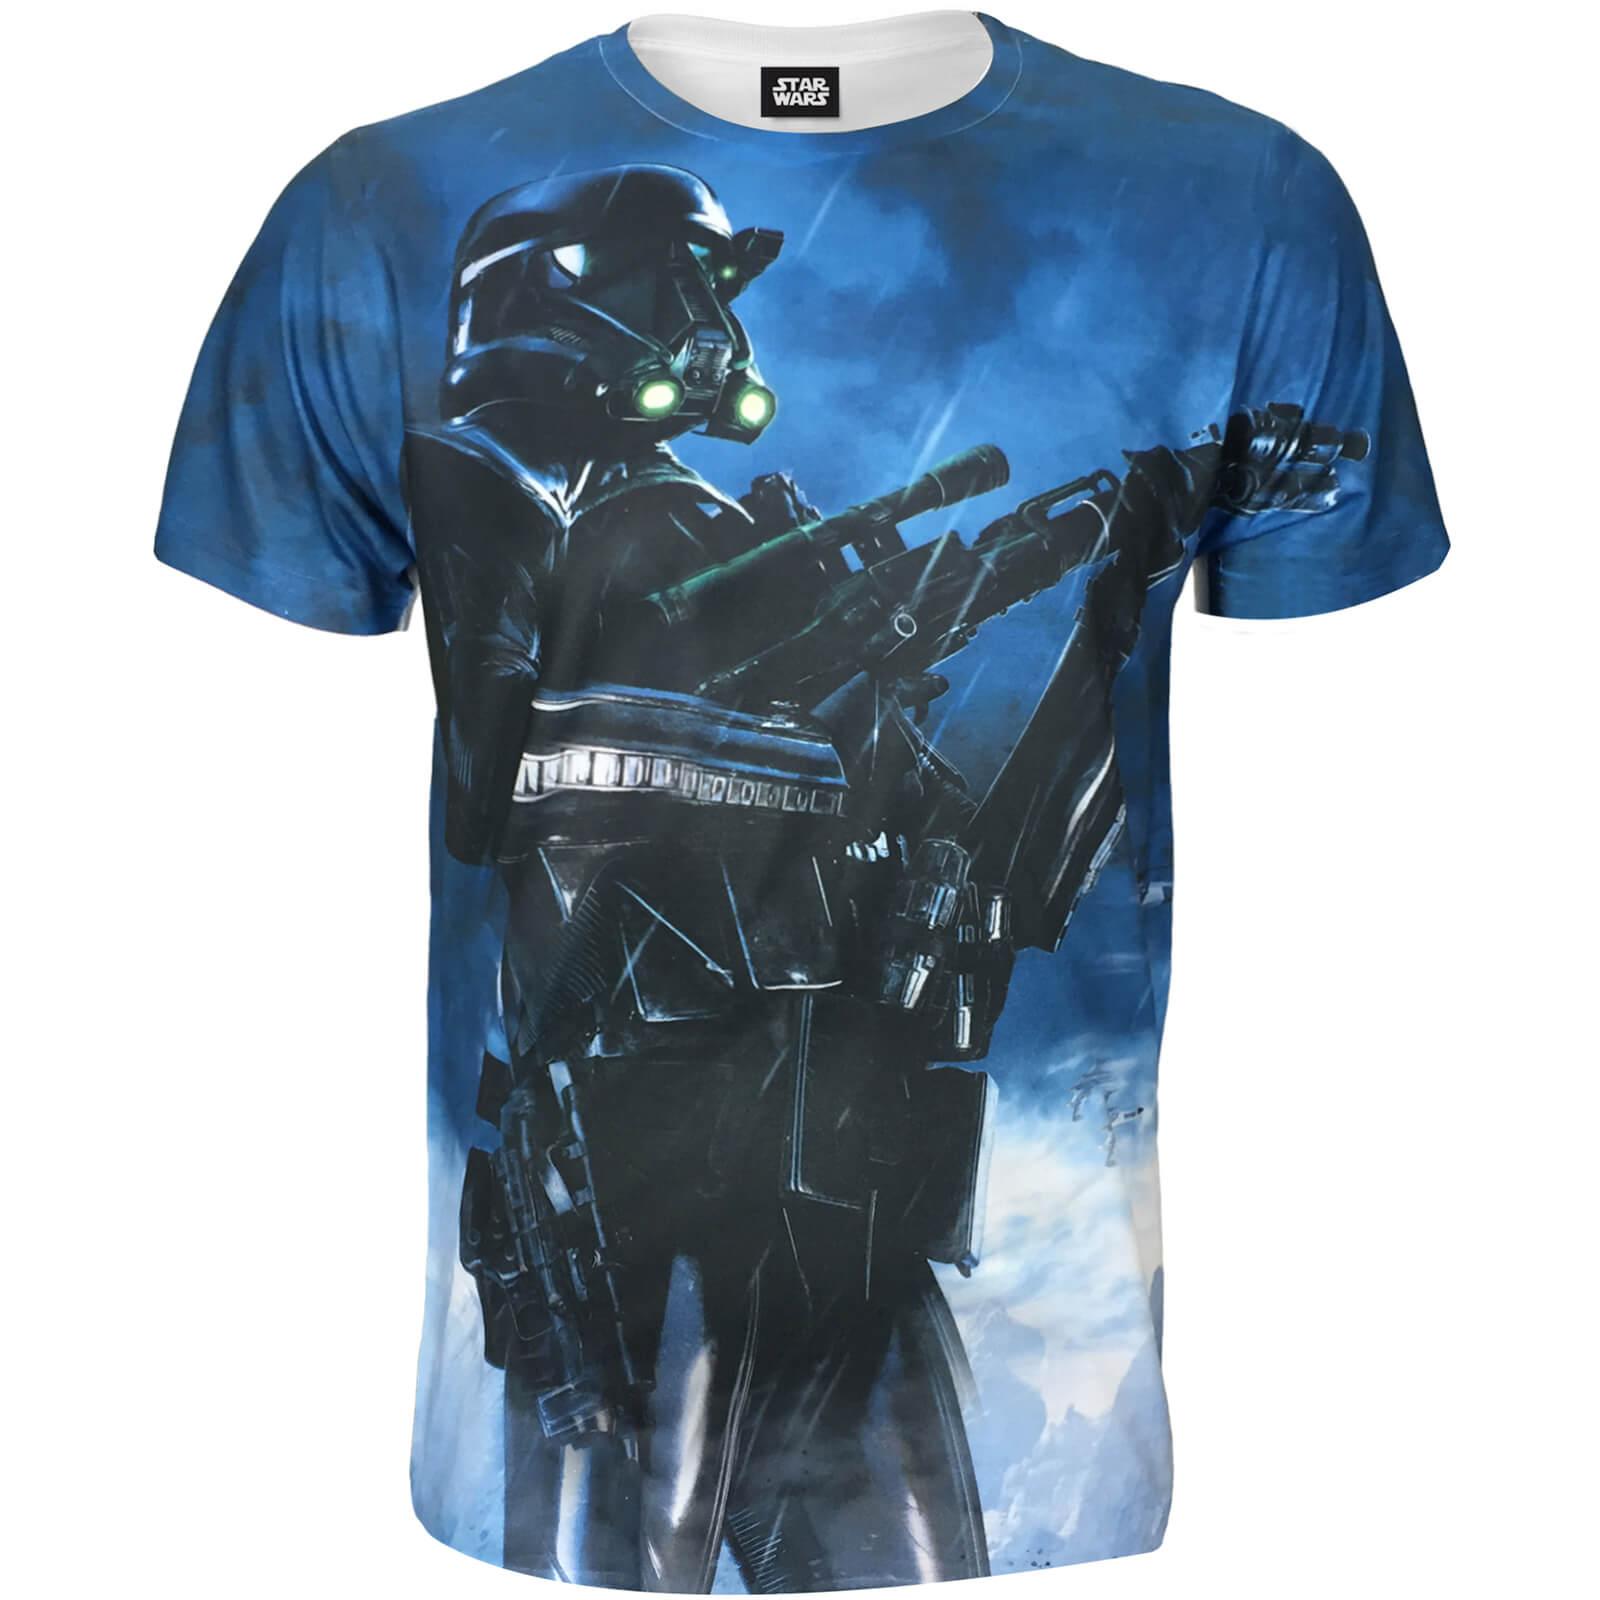 Geek Clothing Star Wars Rogue One Men's Battle Stance Death Trooper T-Shirt - Blue - M - Blue